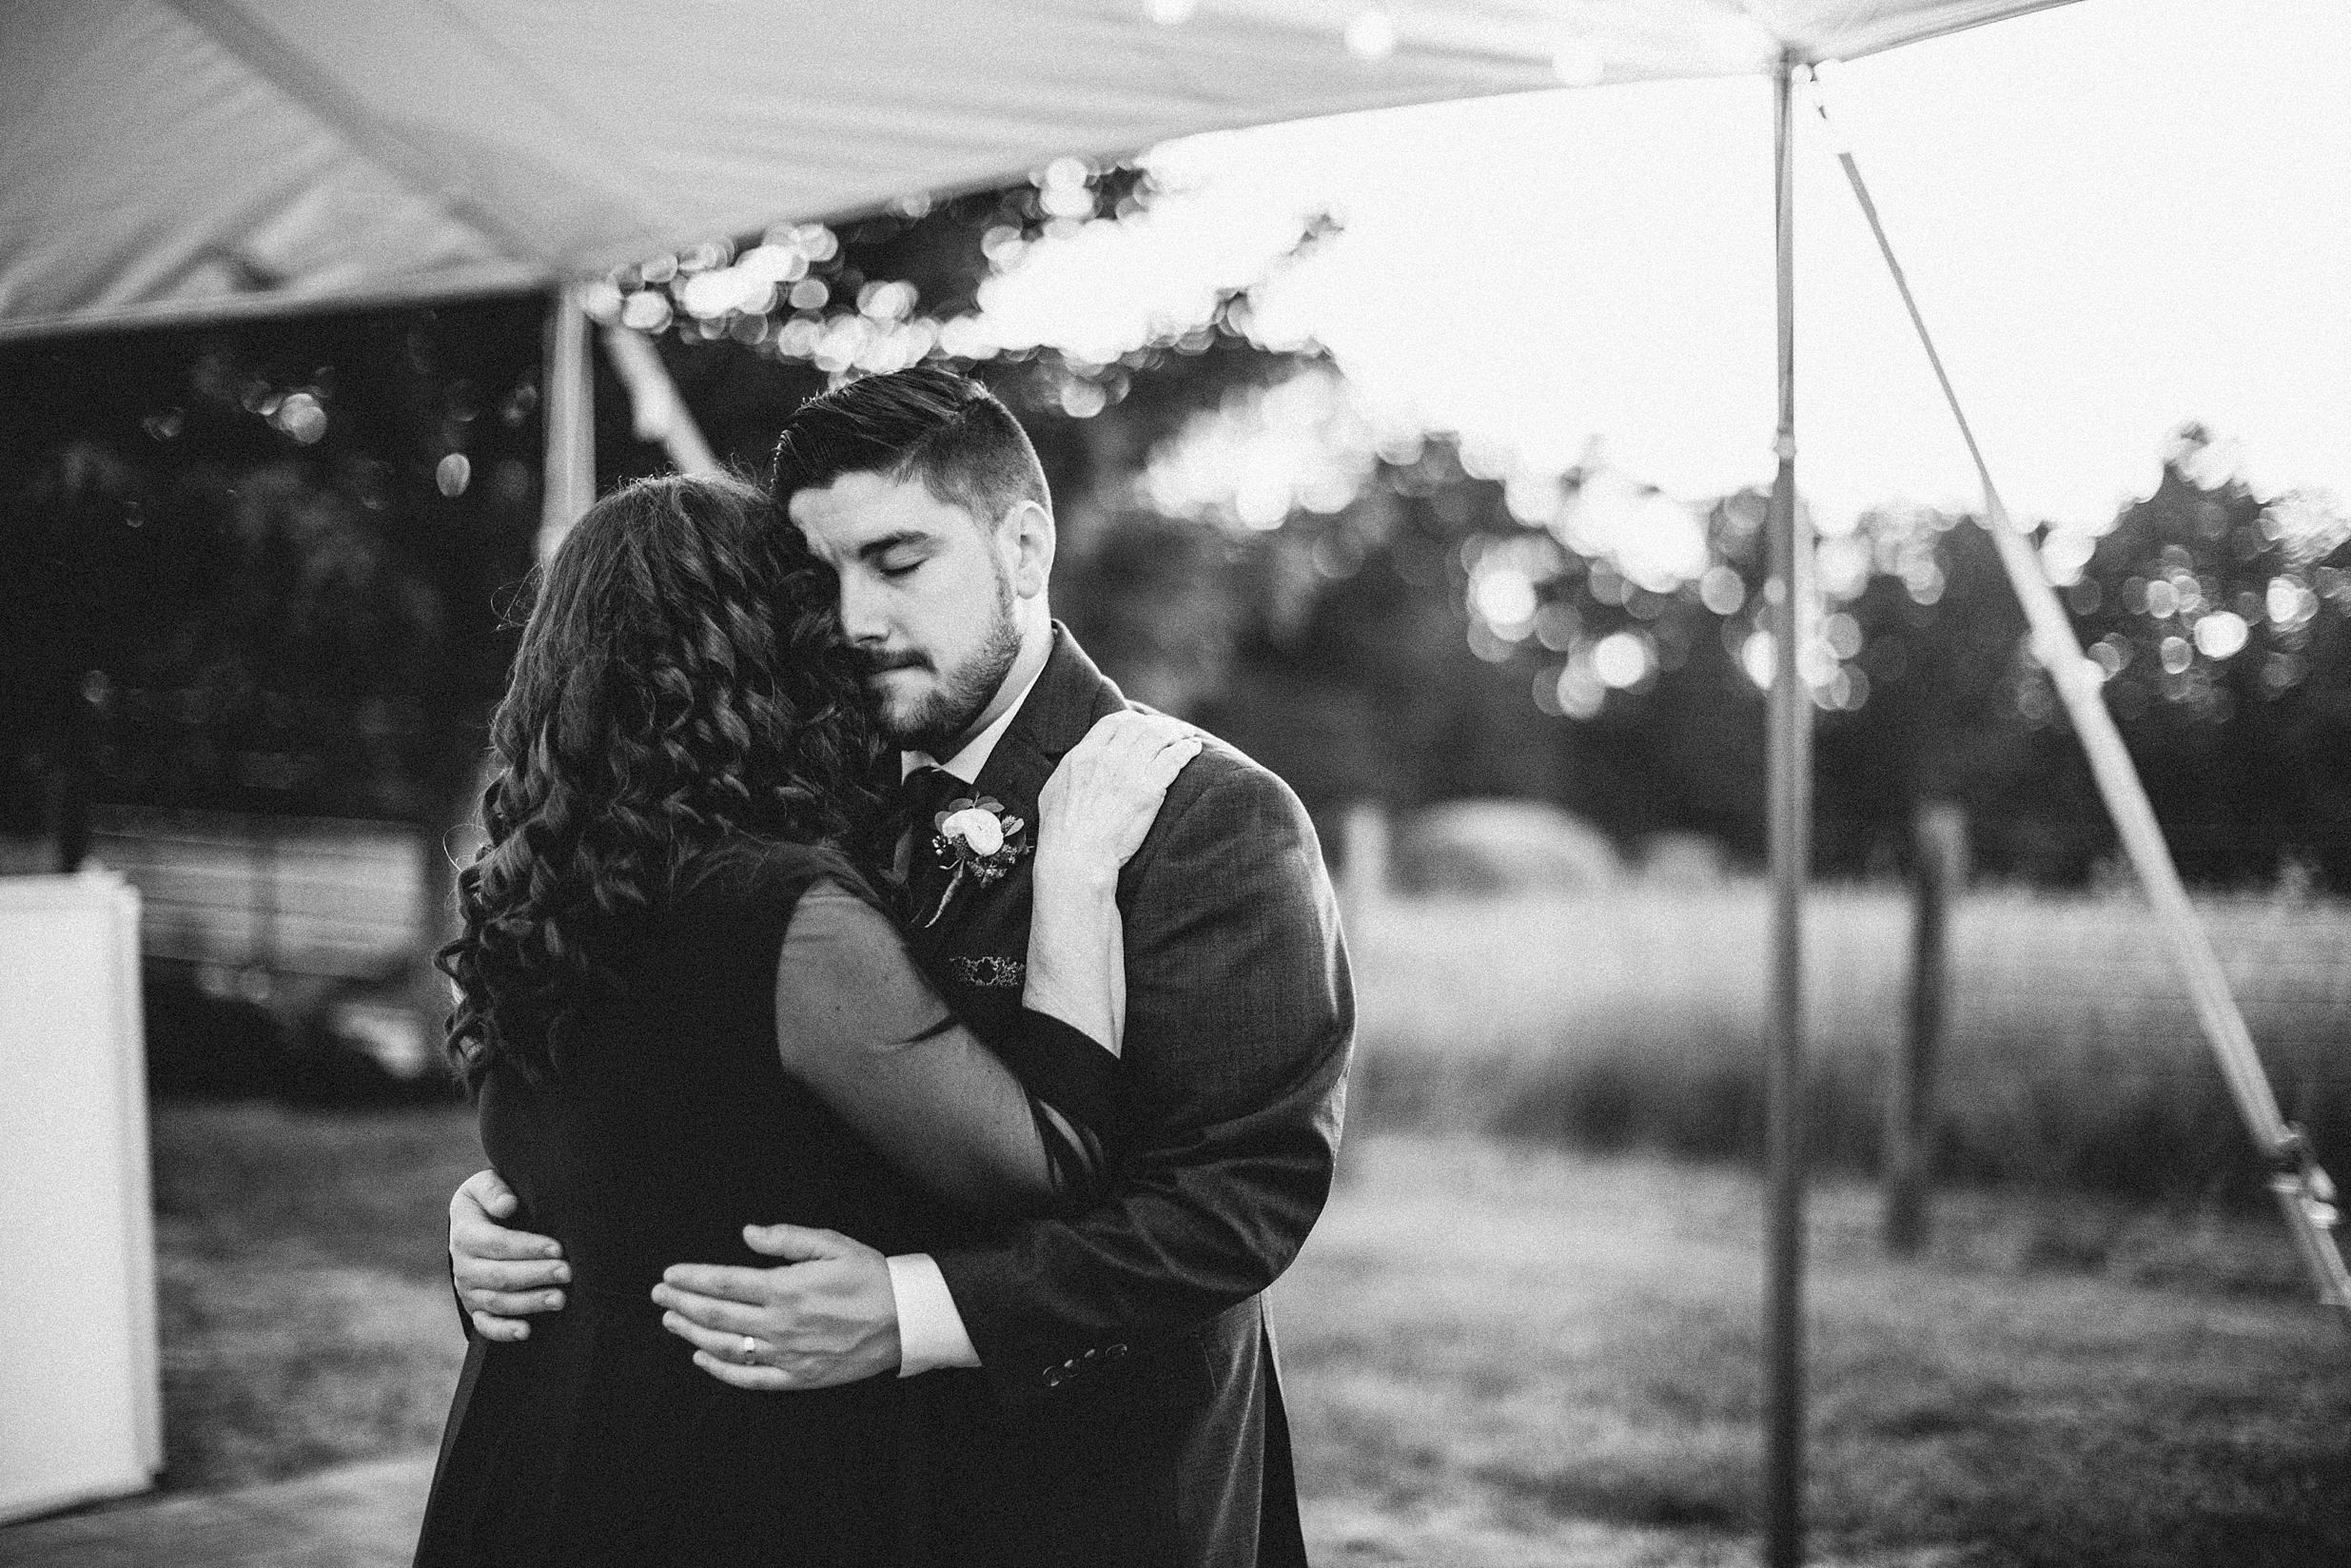 historic-upstate-ny-wedding-church-backyard-photographer_0057.jpg